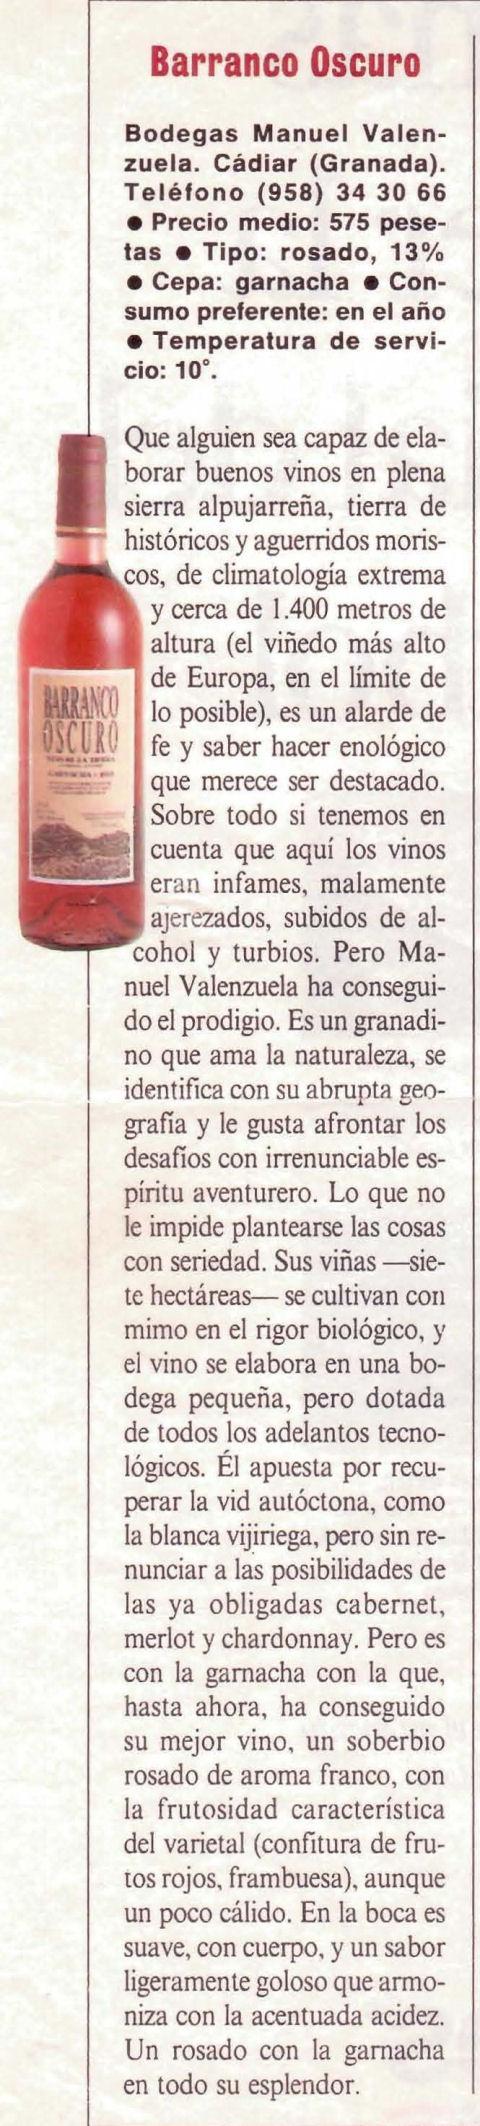 Barranco Oscuro Rosado Garnacha | El Pais Semanal